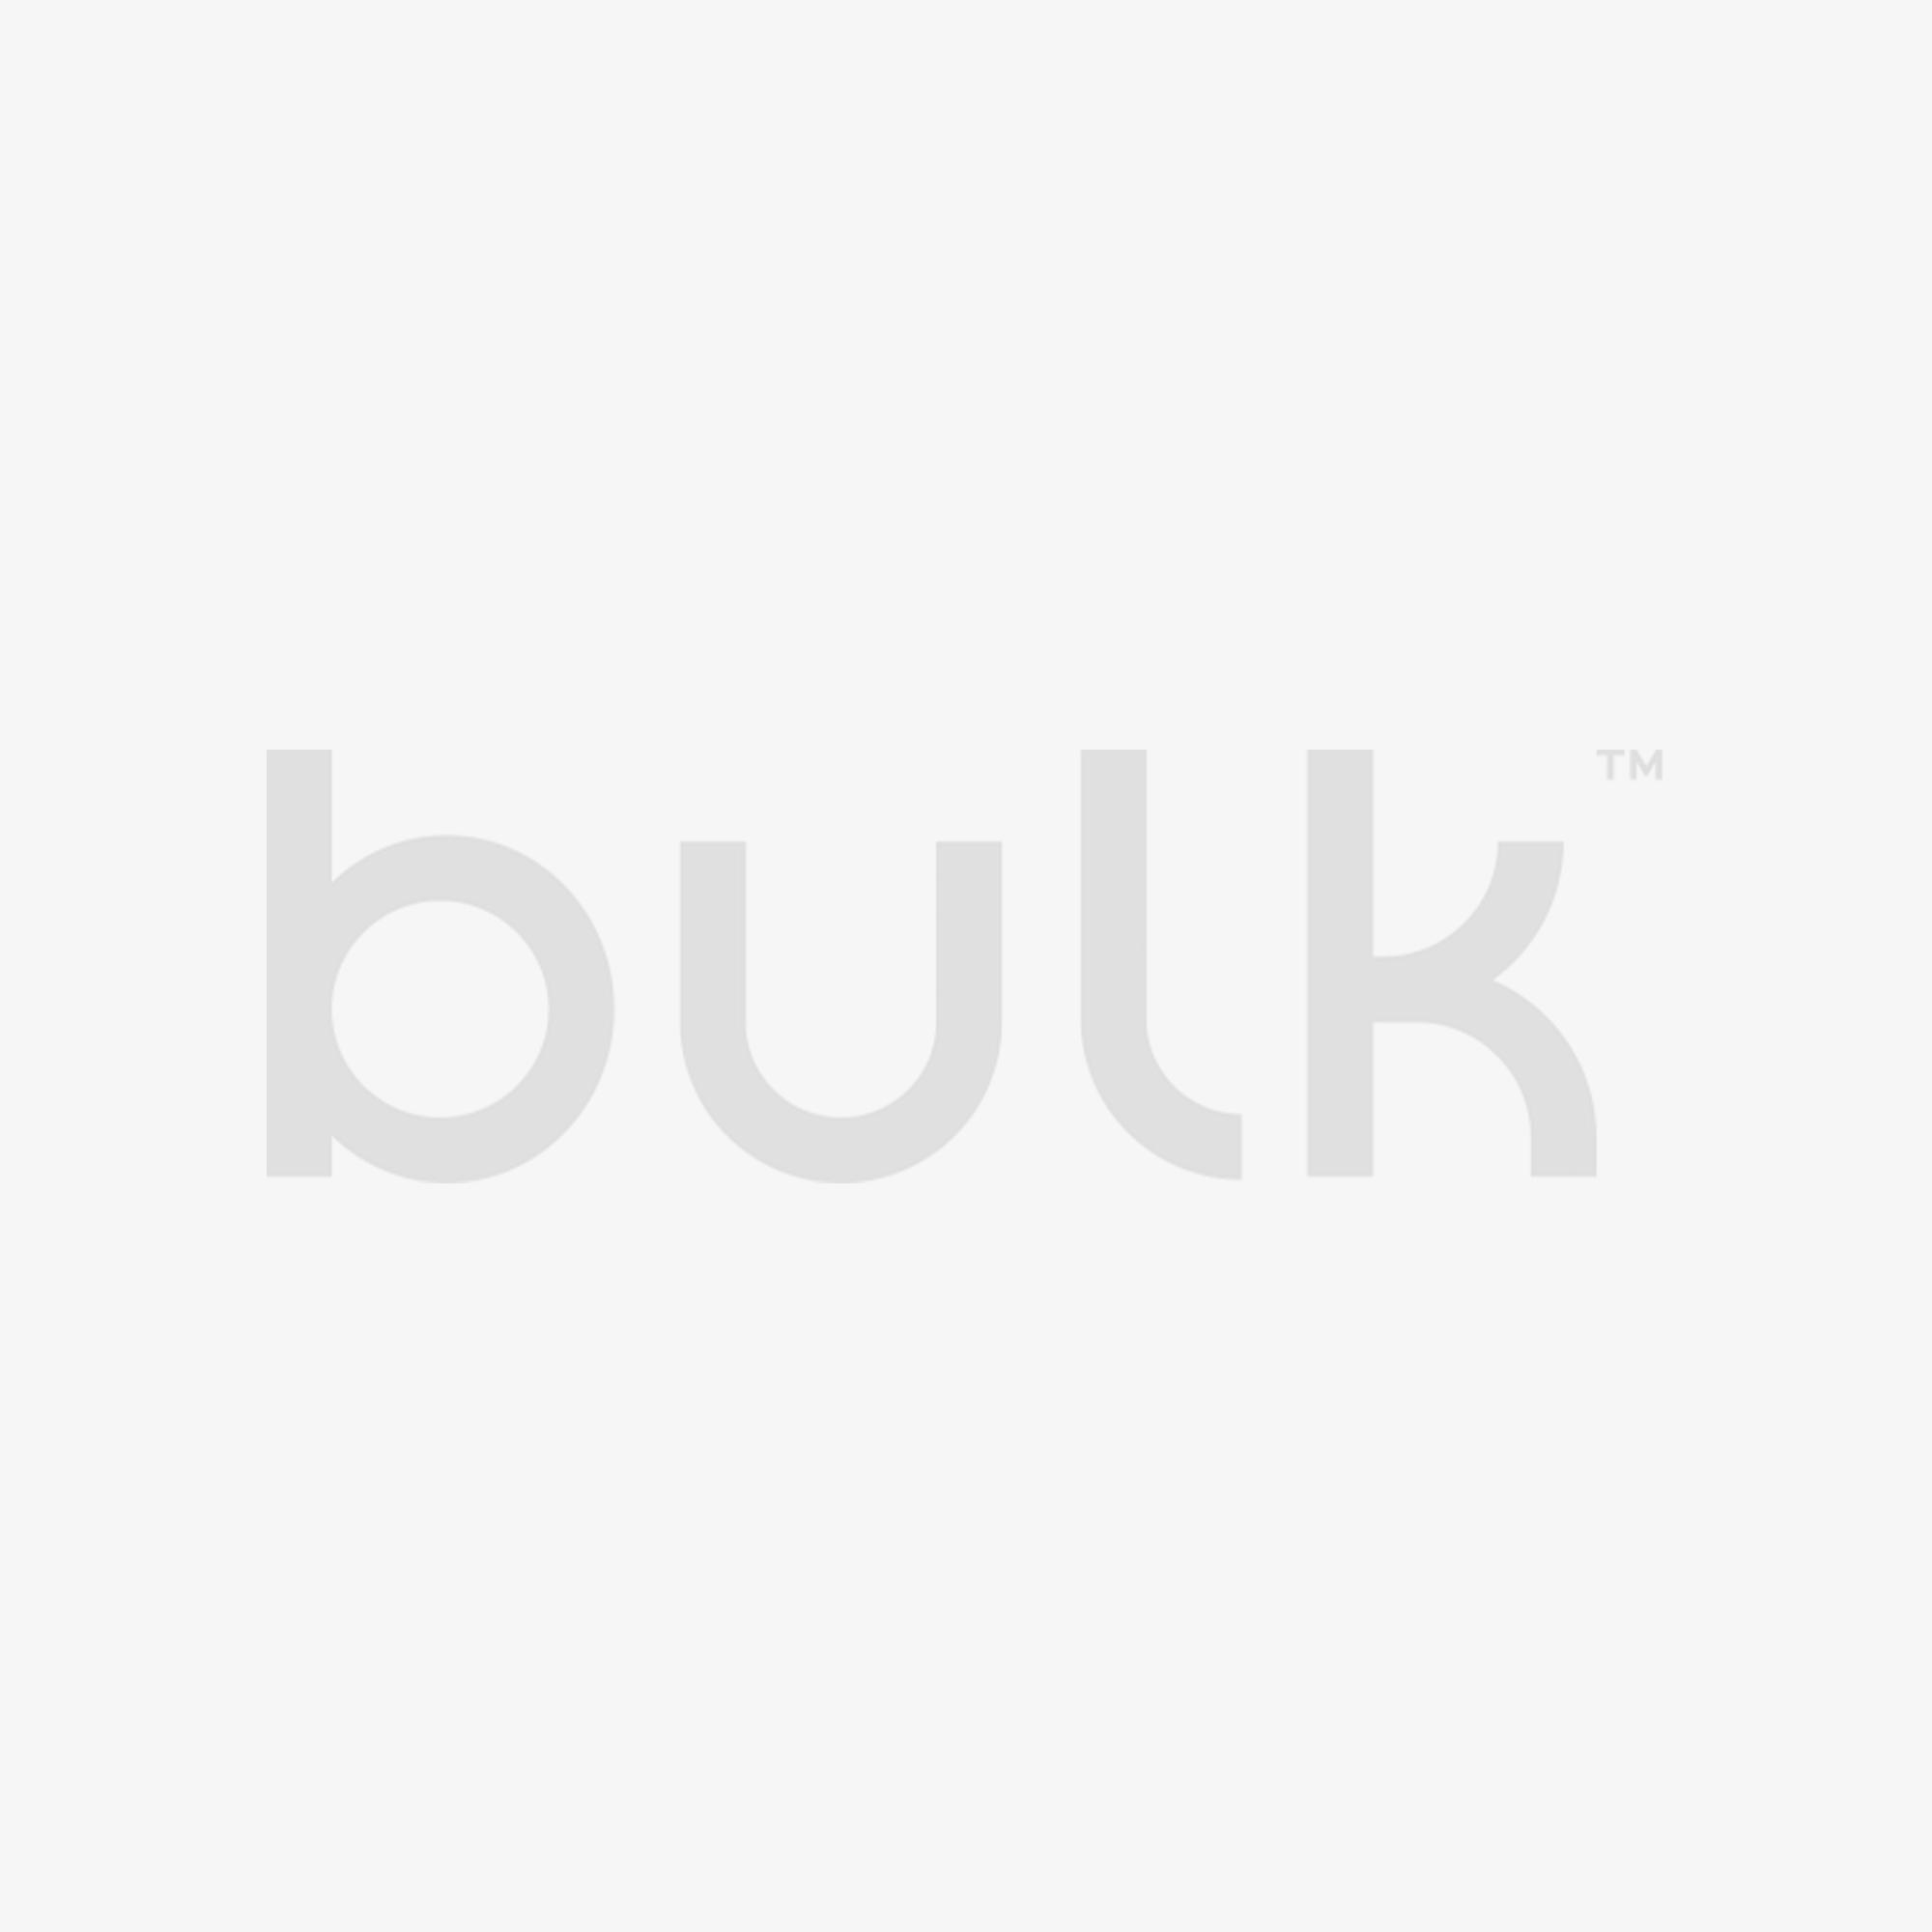 BULK POWDERS™ Muskel Fit Stringer